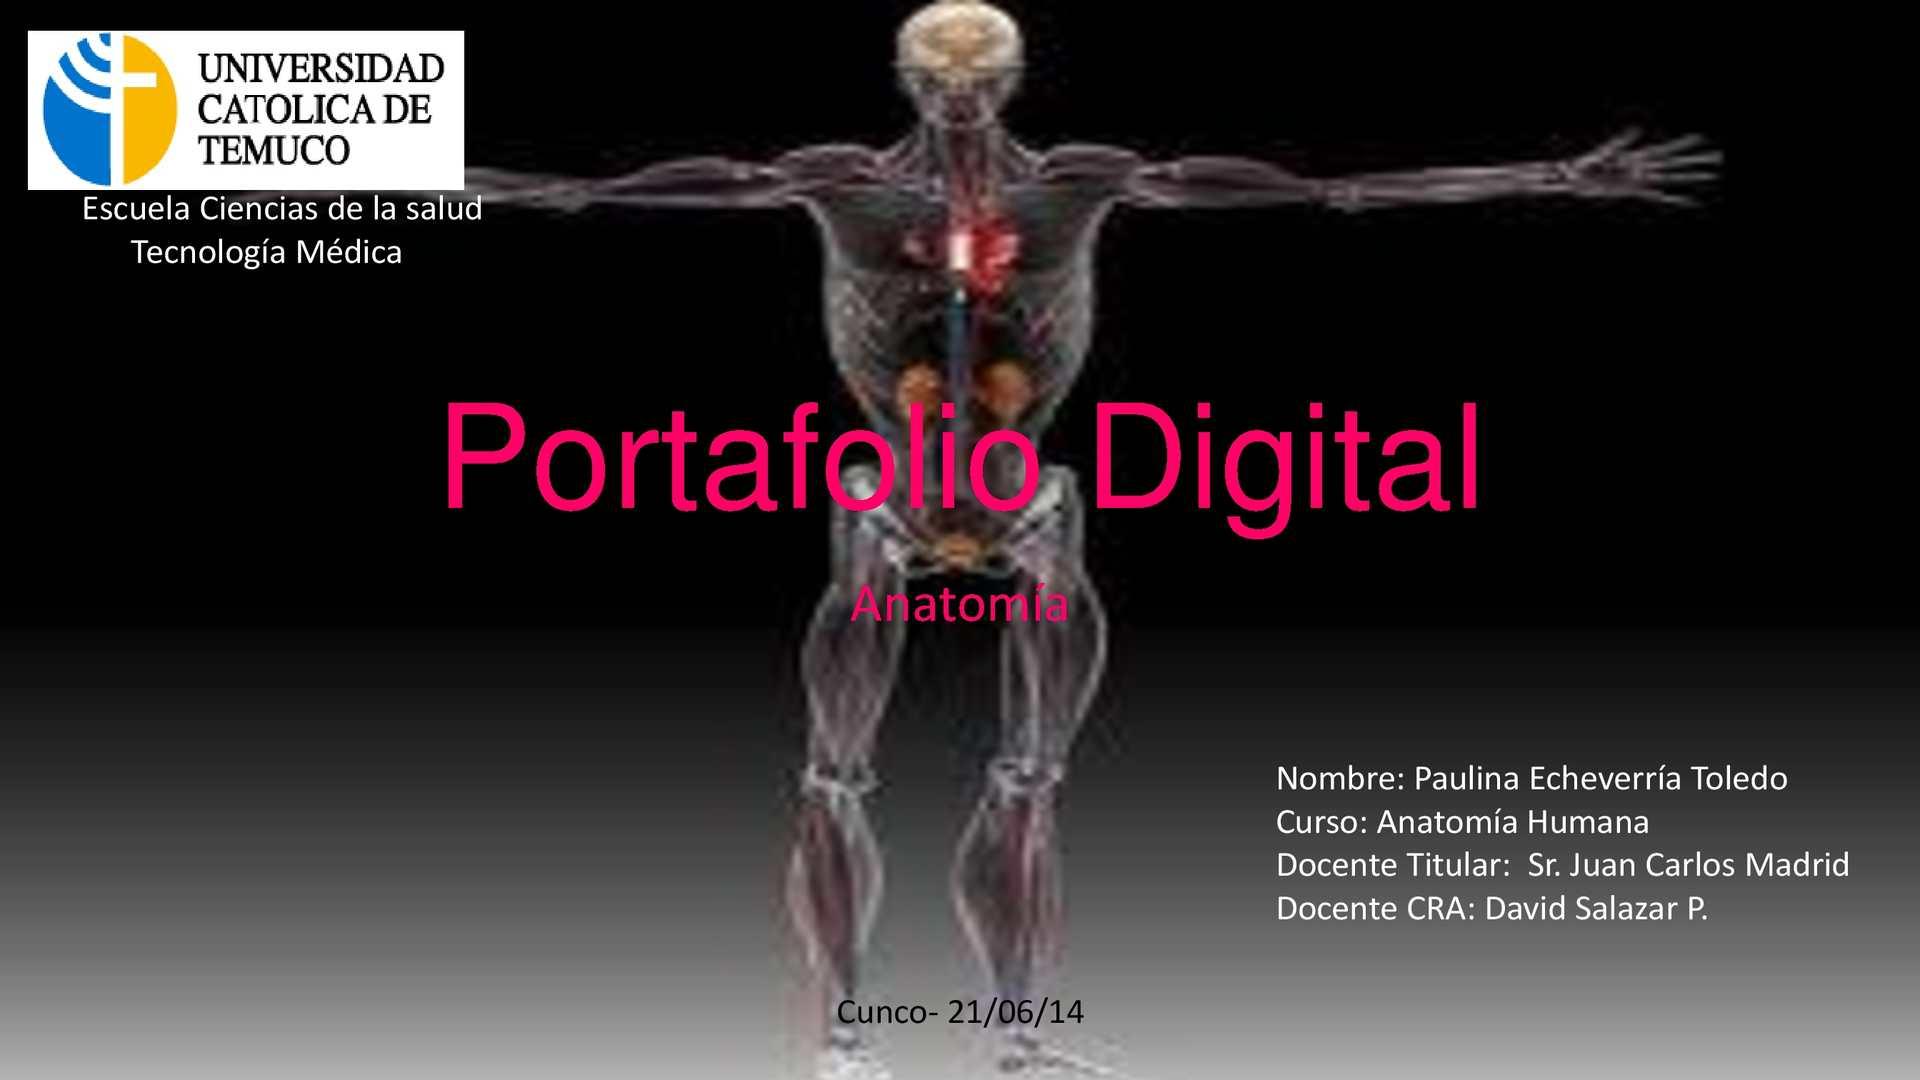 Calaméo - Portafolio digital-Anatomía-Paulina Echeverría Toledo